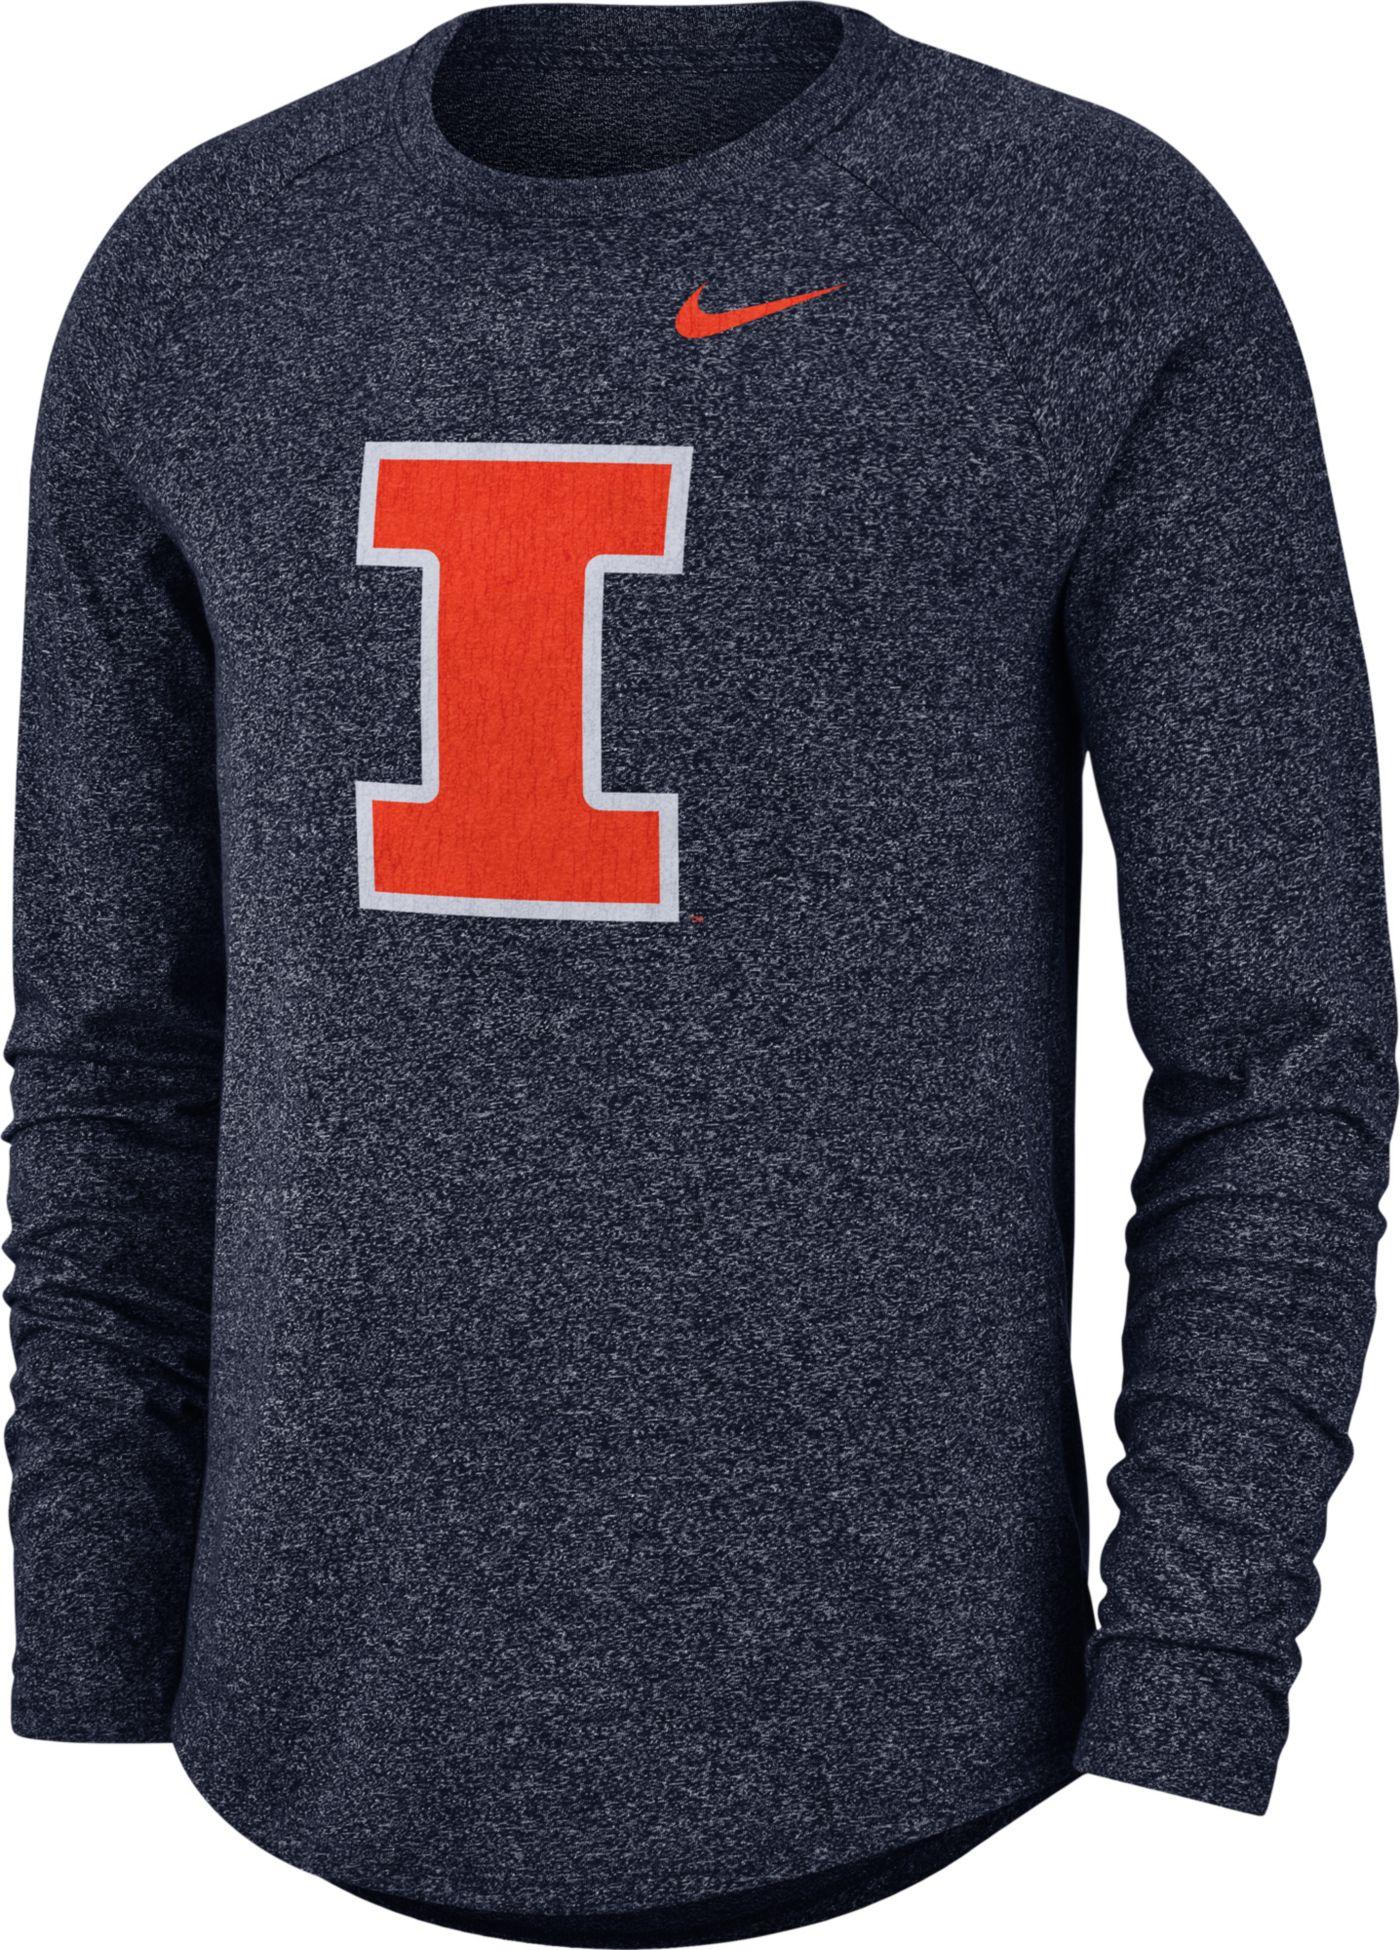 Nike Men's Illinois Fighting Illini Blue Marled Raglan Long Sleeve T-Shirt